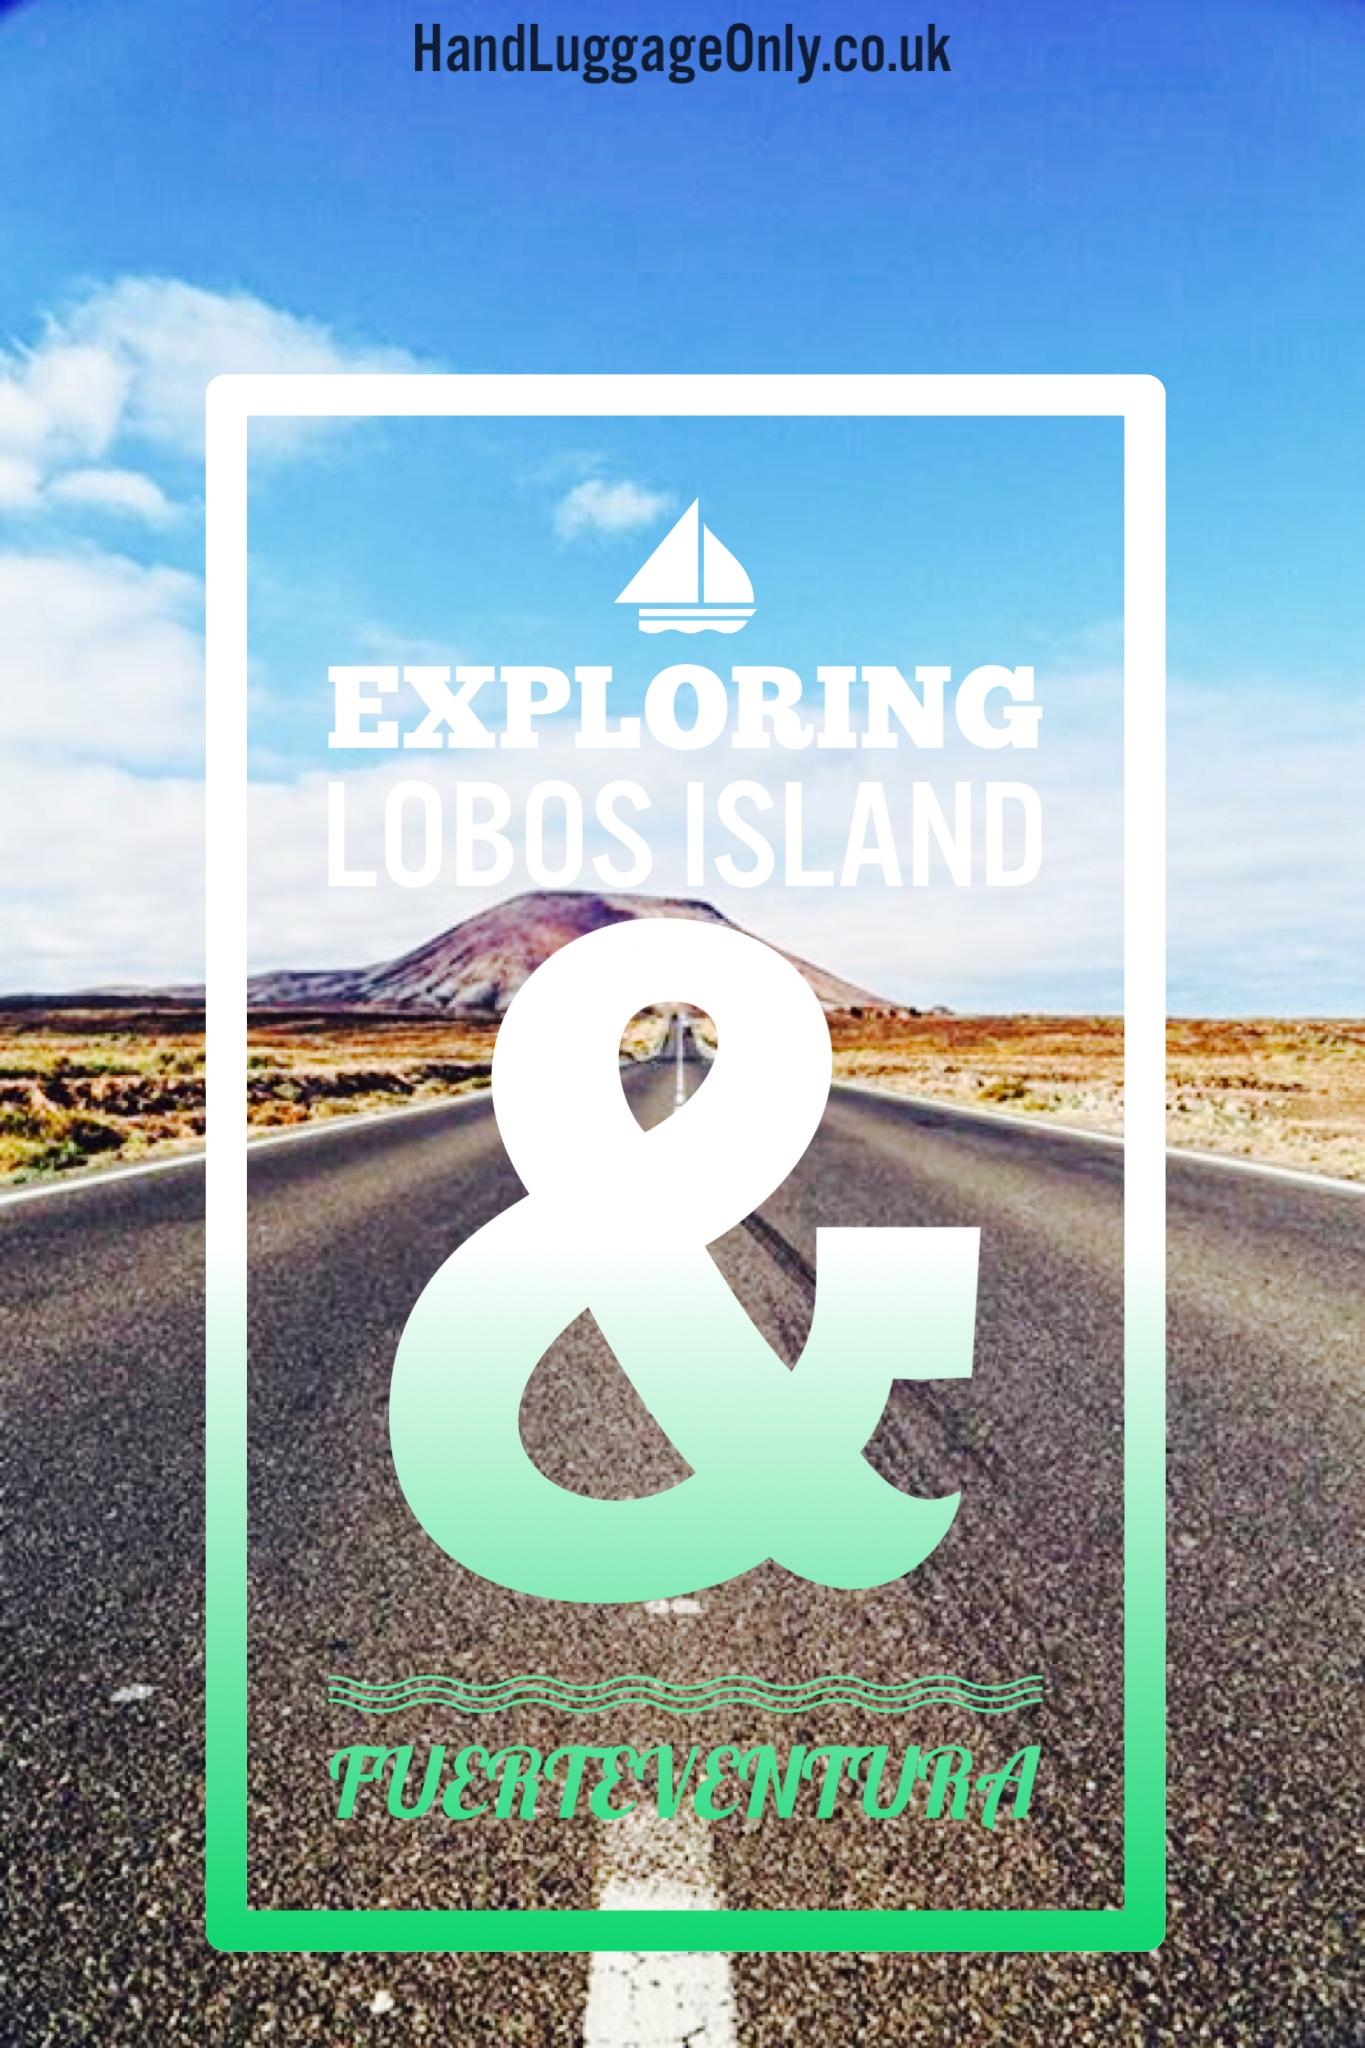 Photo Updates From Lobos Island And Fuerteventura (4)